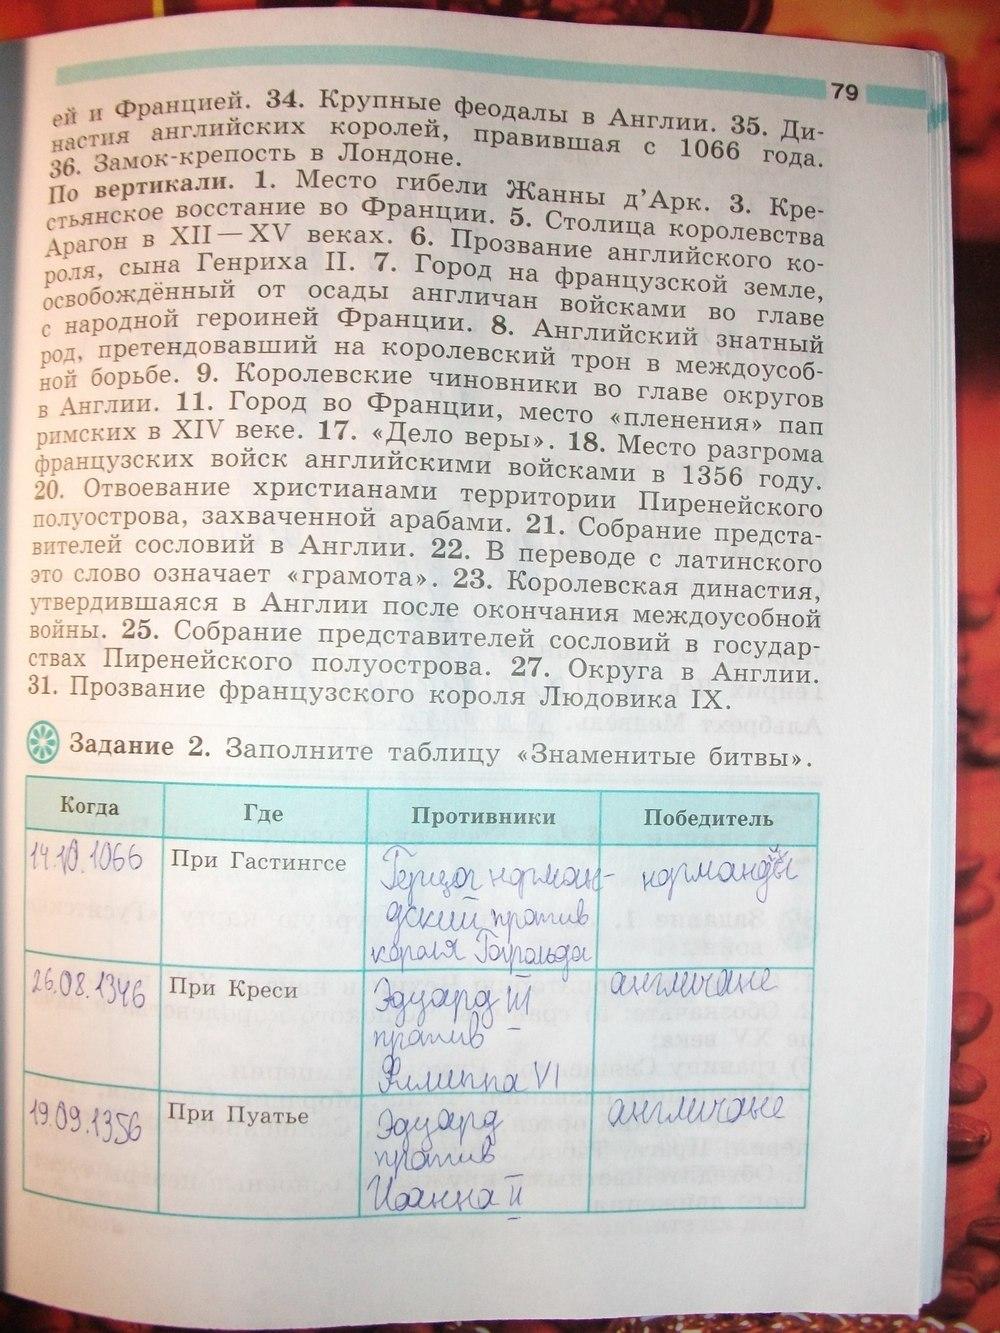 Гдз По Истории 7 Класс К Учебнику Ведюшкина